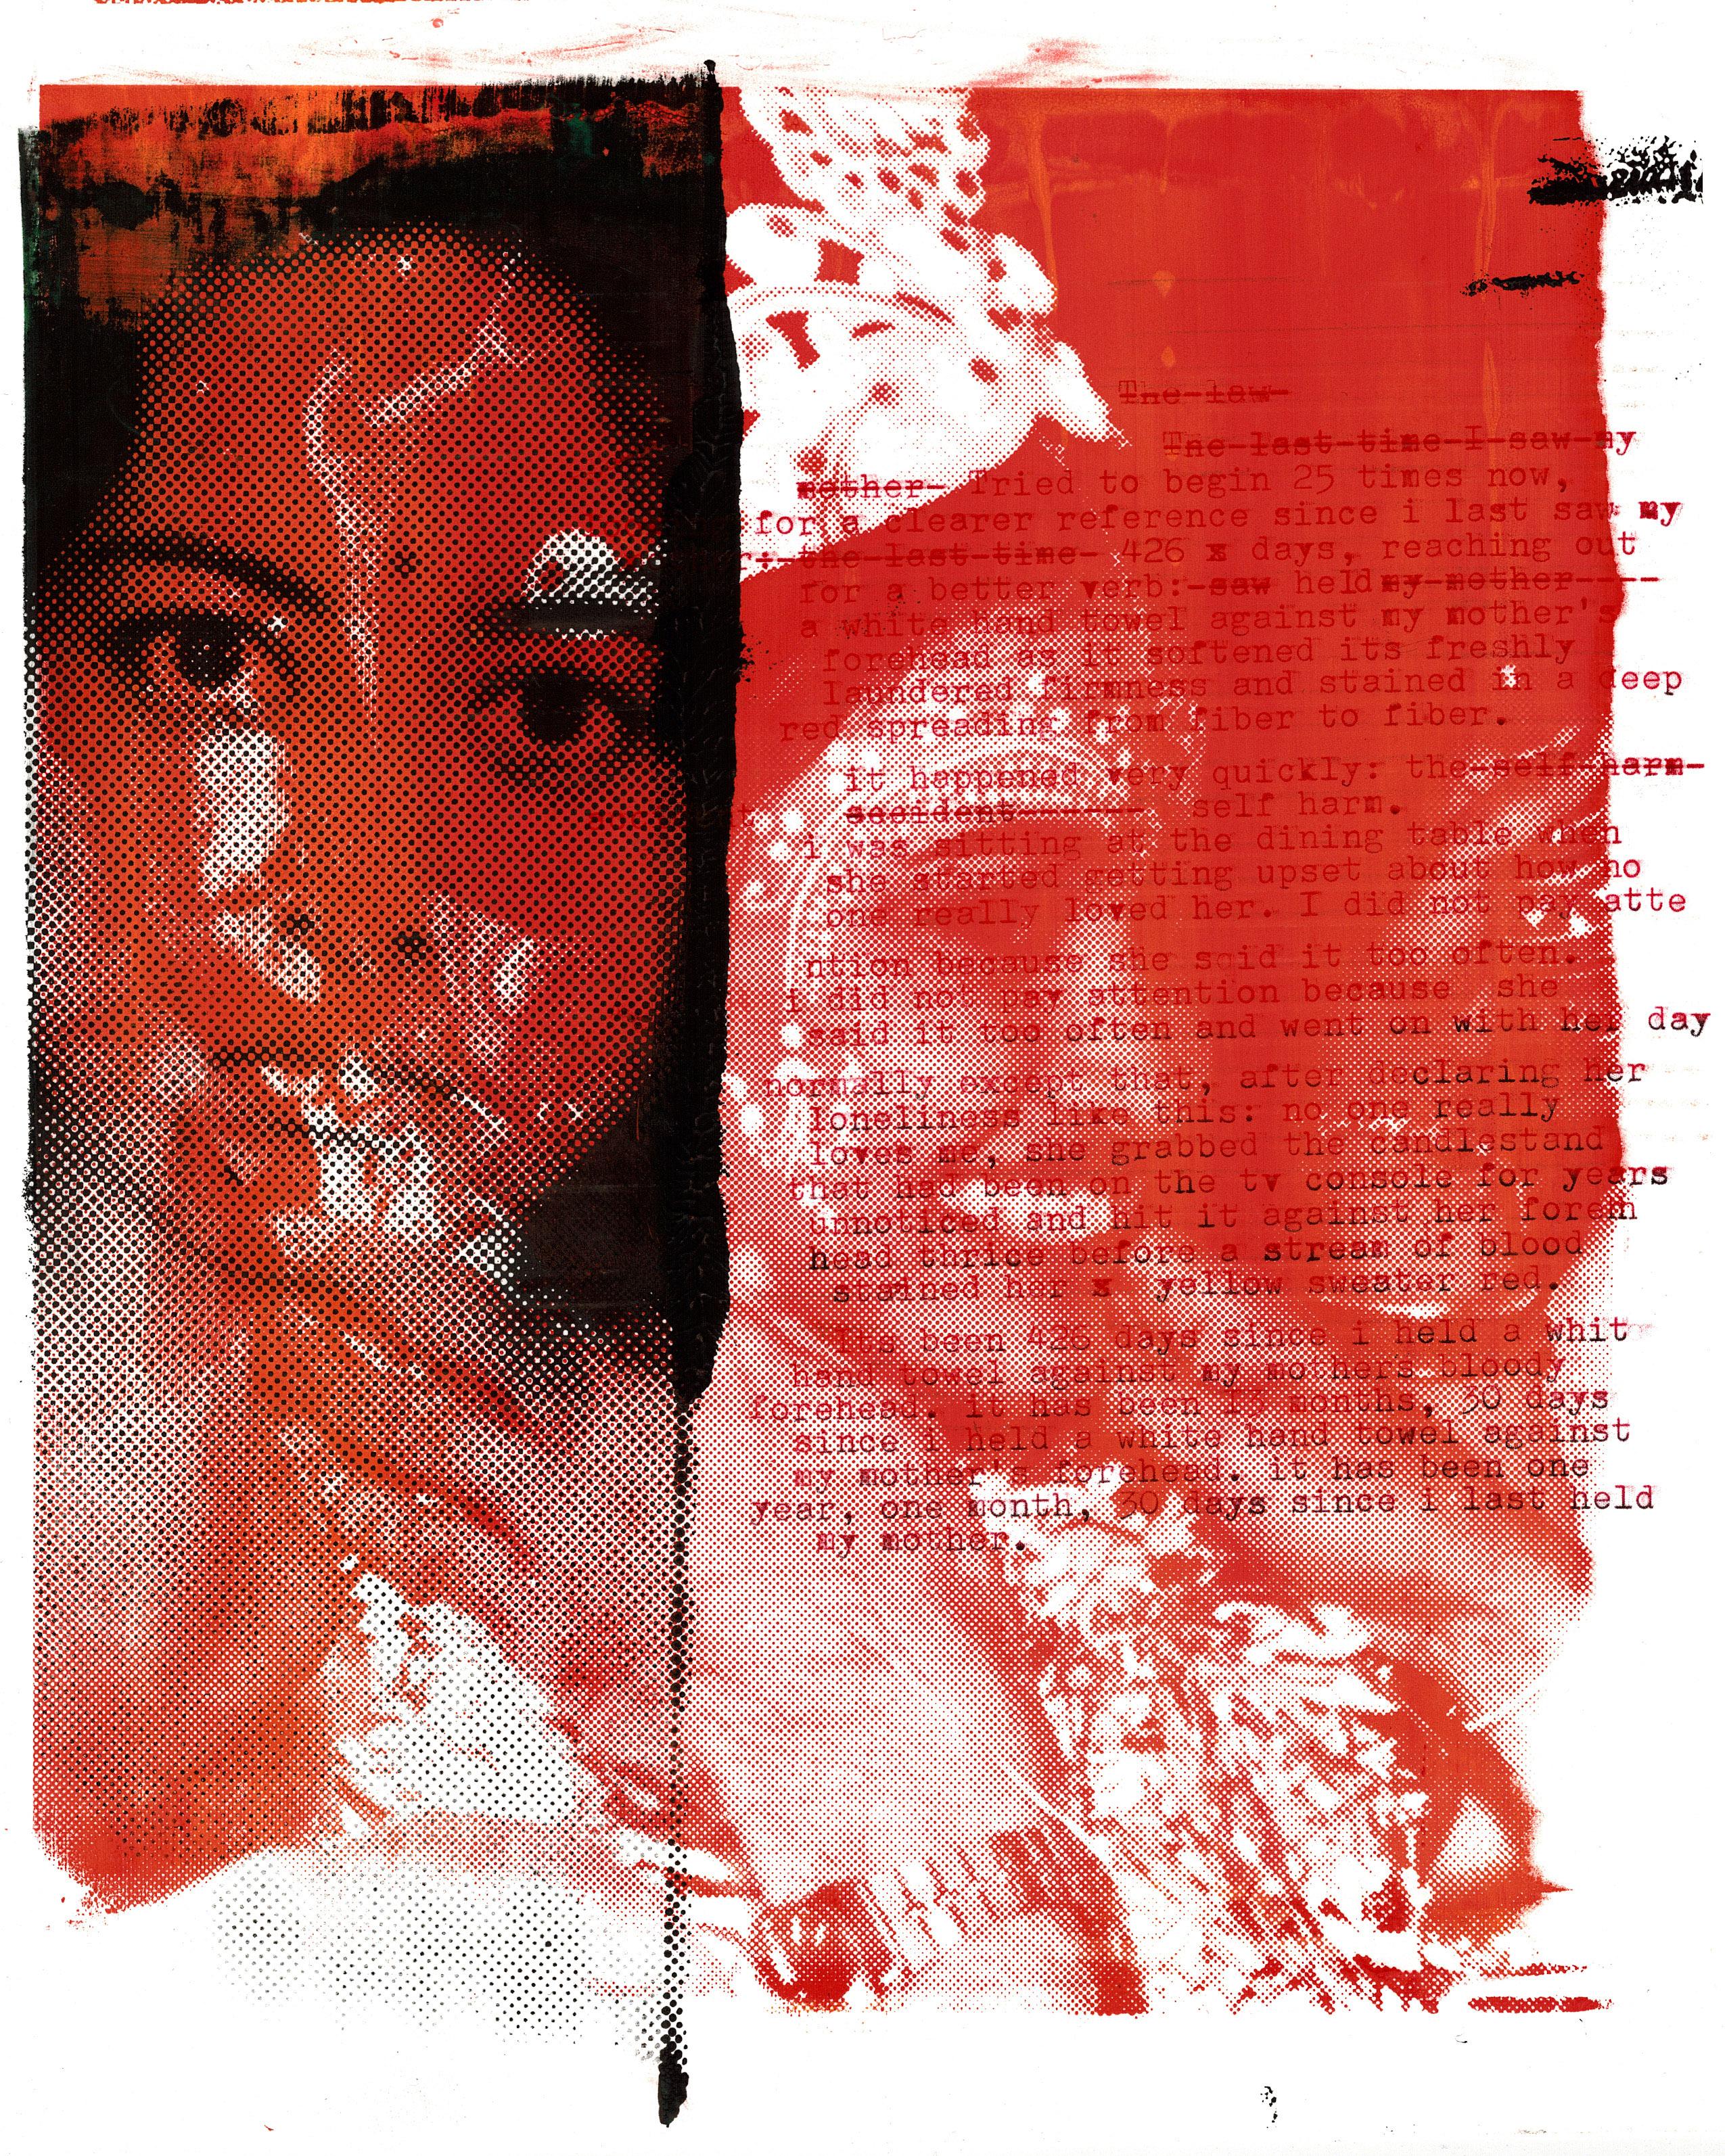 Cheryl Mukherji The Last Time artwork